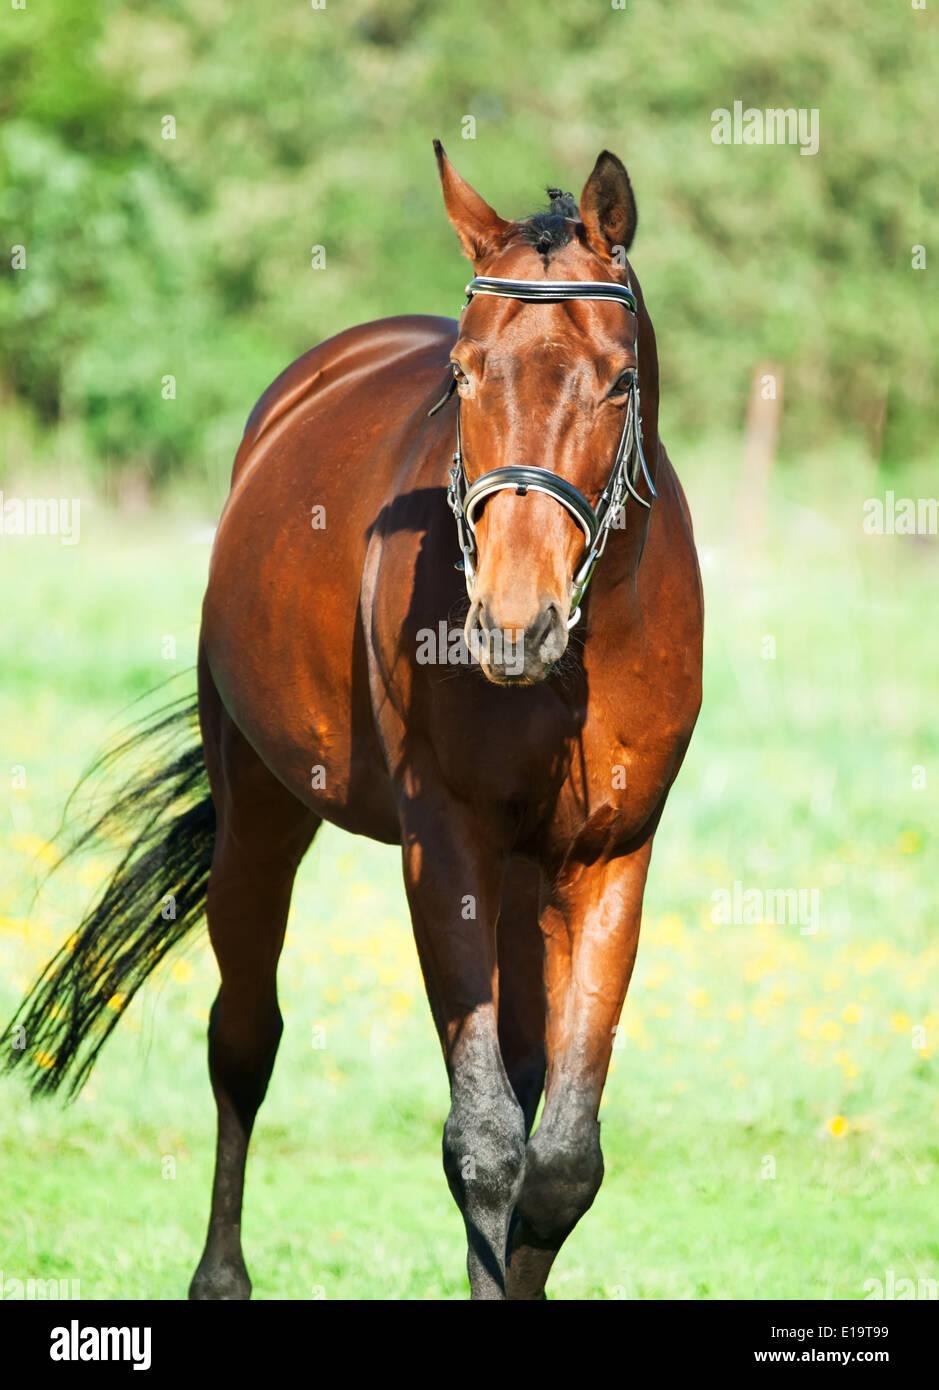 bay sportive horse - Stock Image